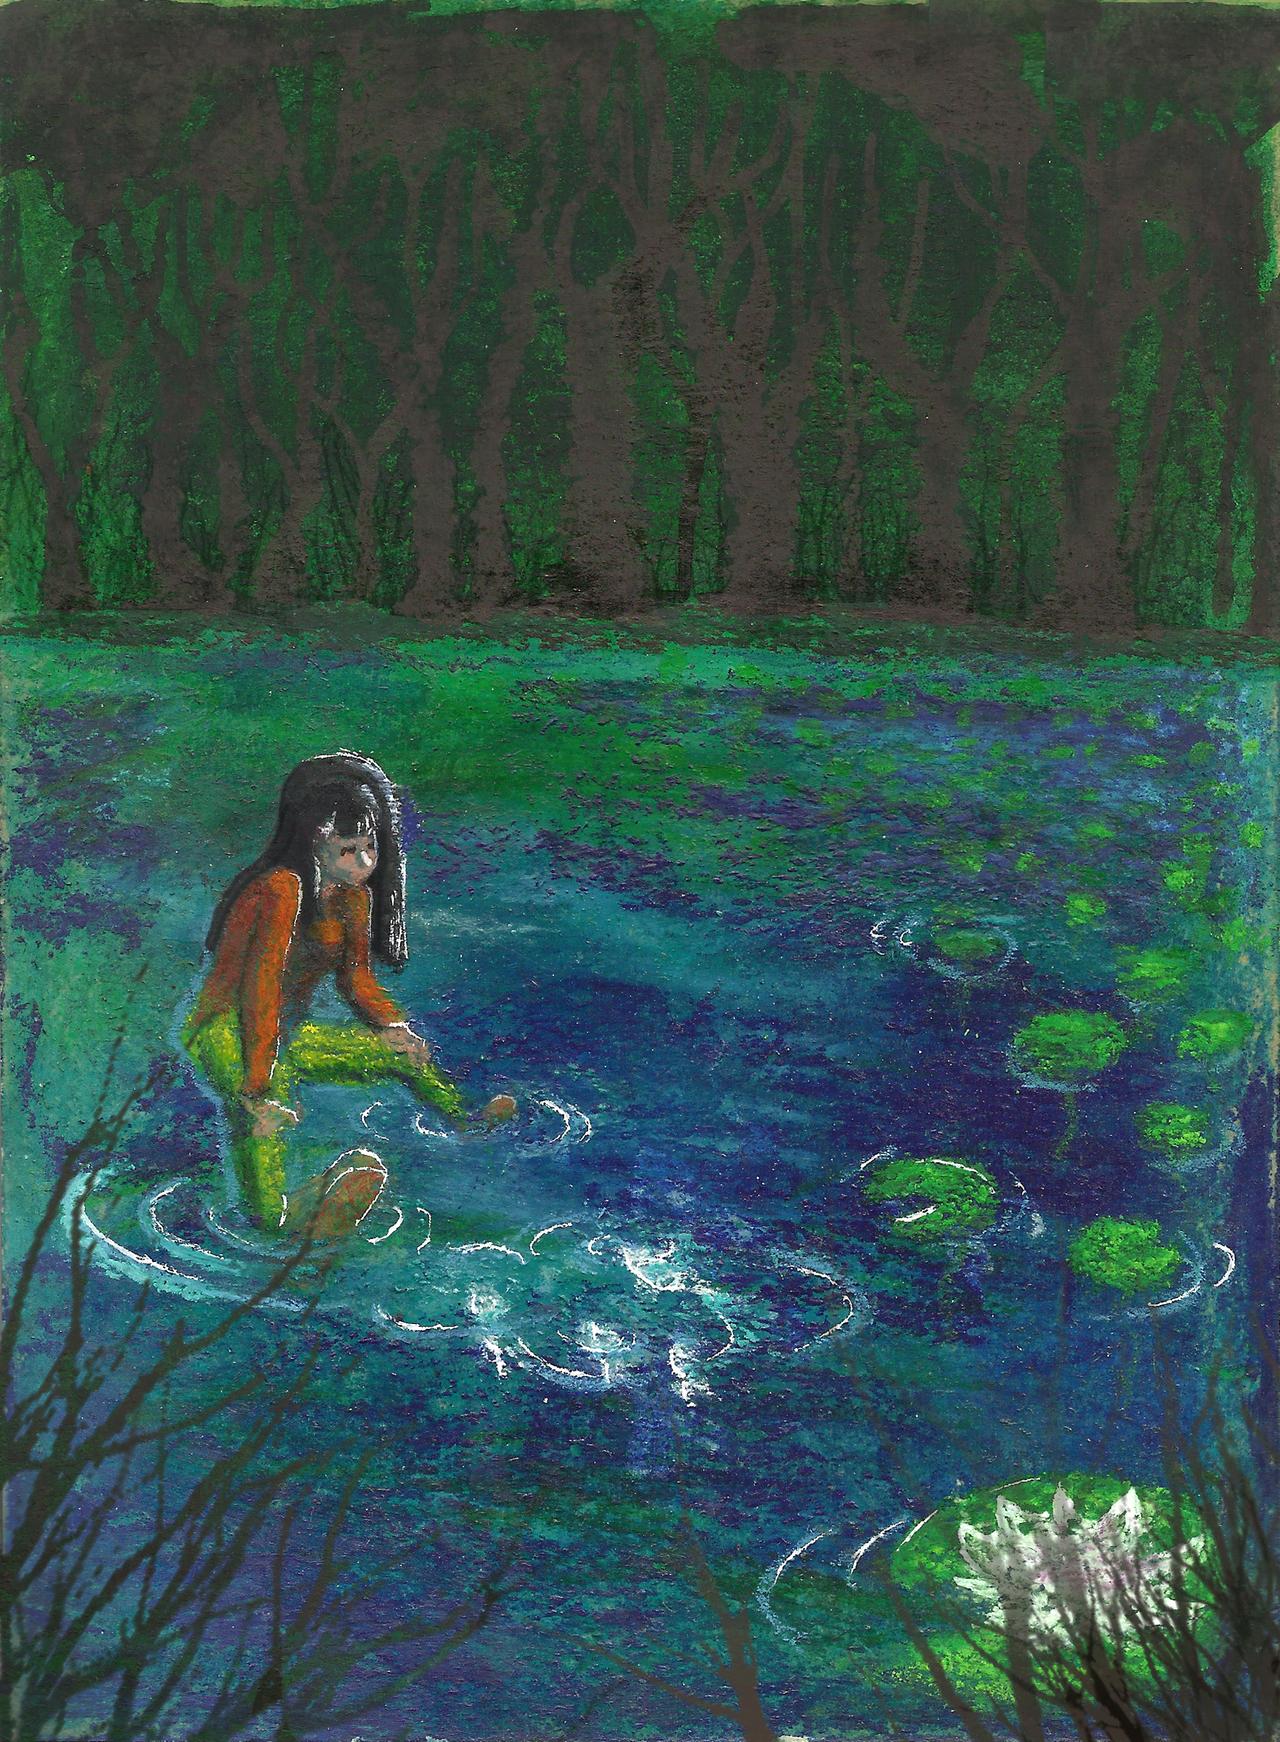 Water Lily by cybersuzy